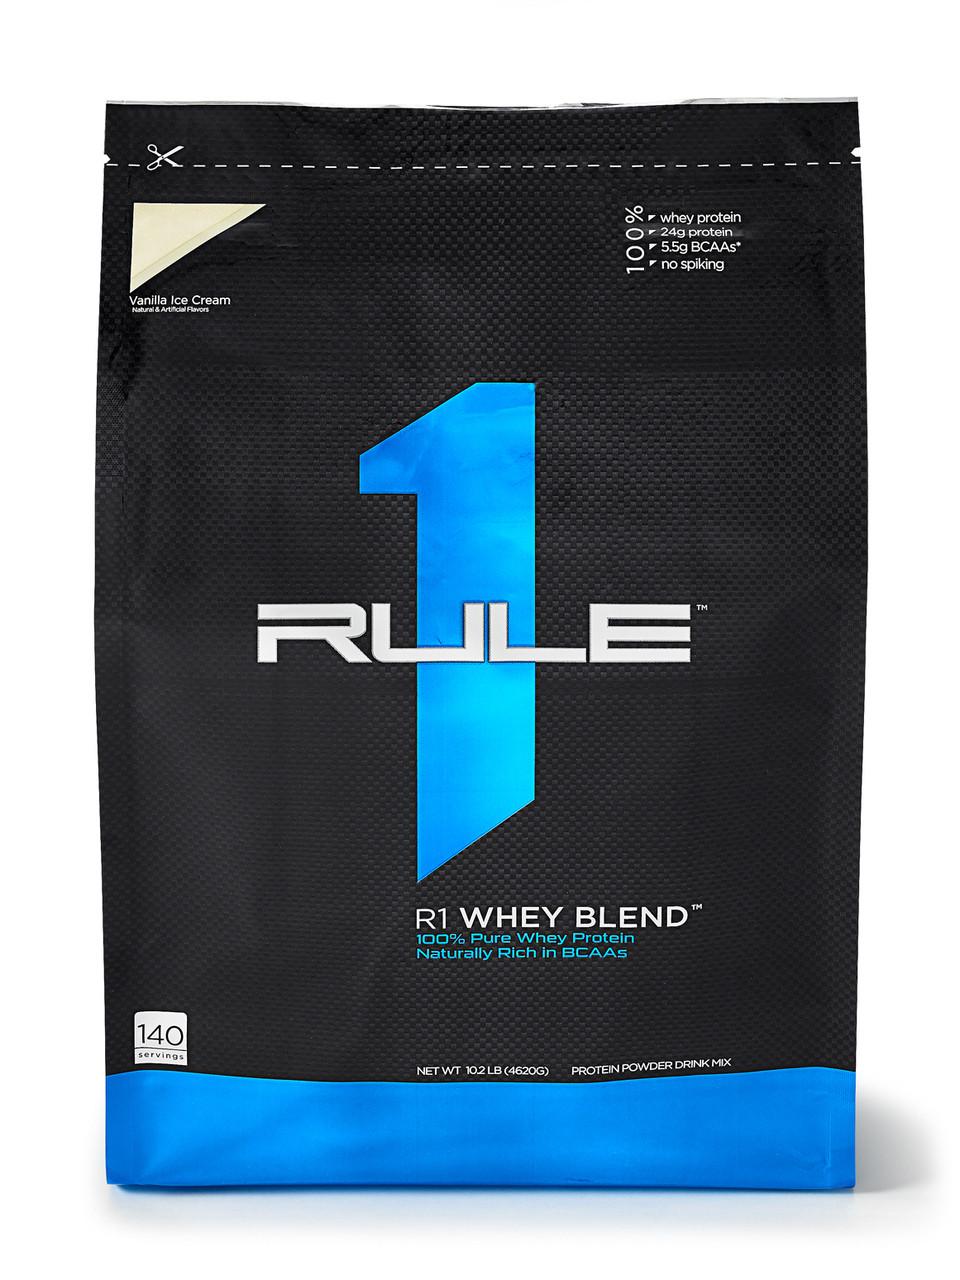 R1_Whey Blend 4,7 кг - Chocolate Fudge